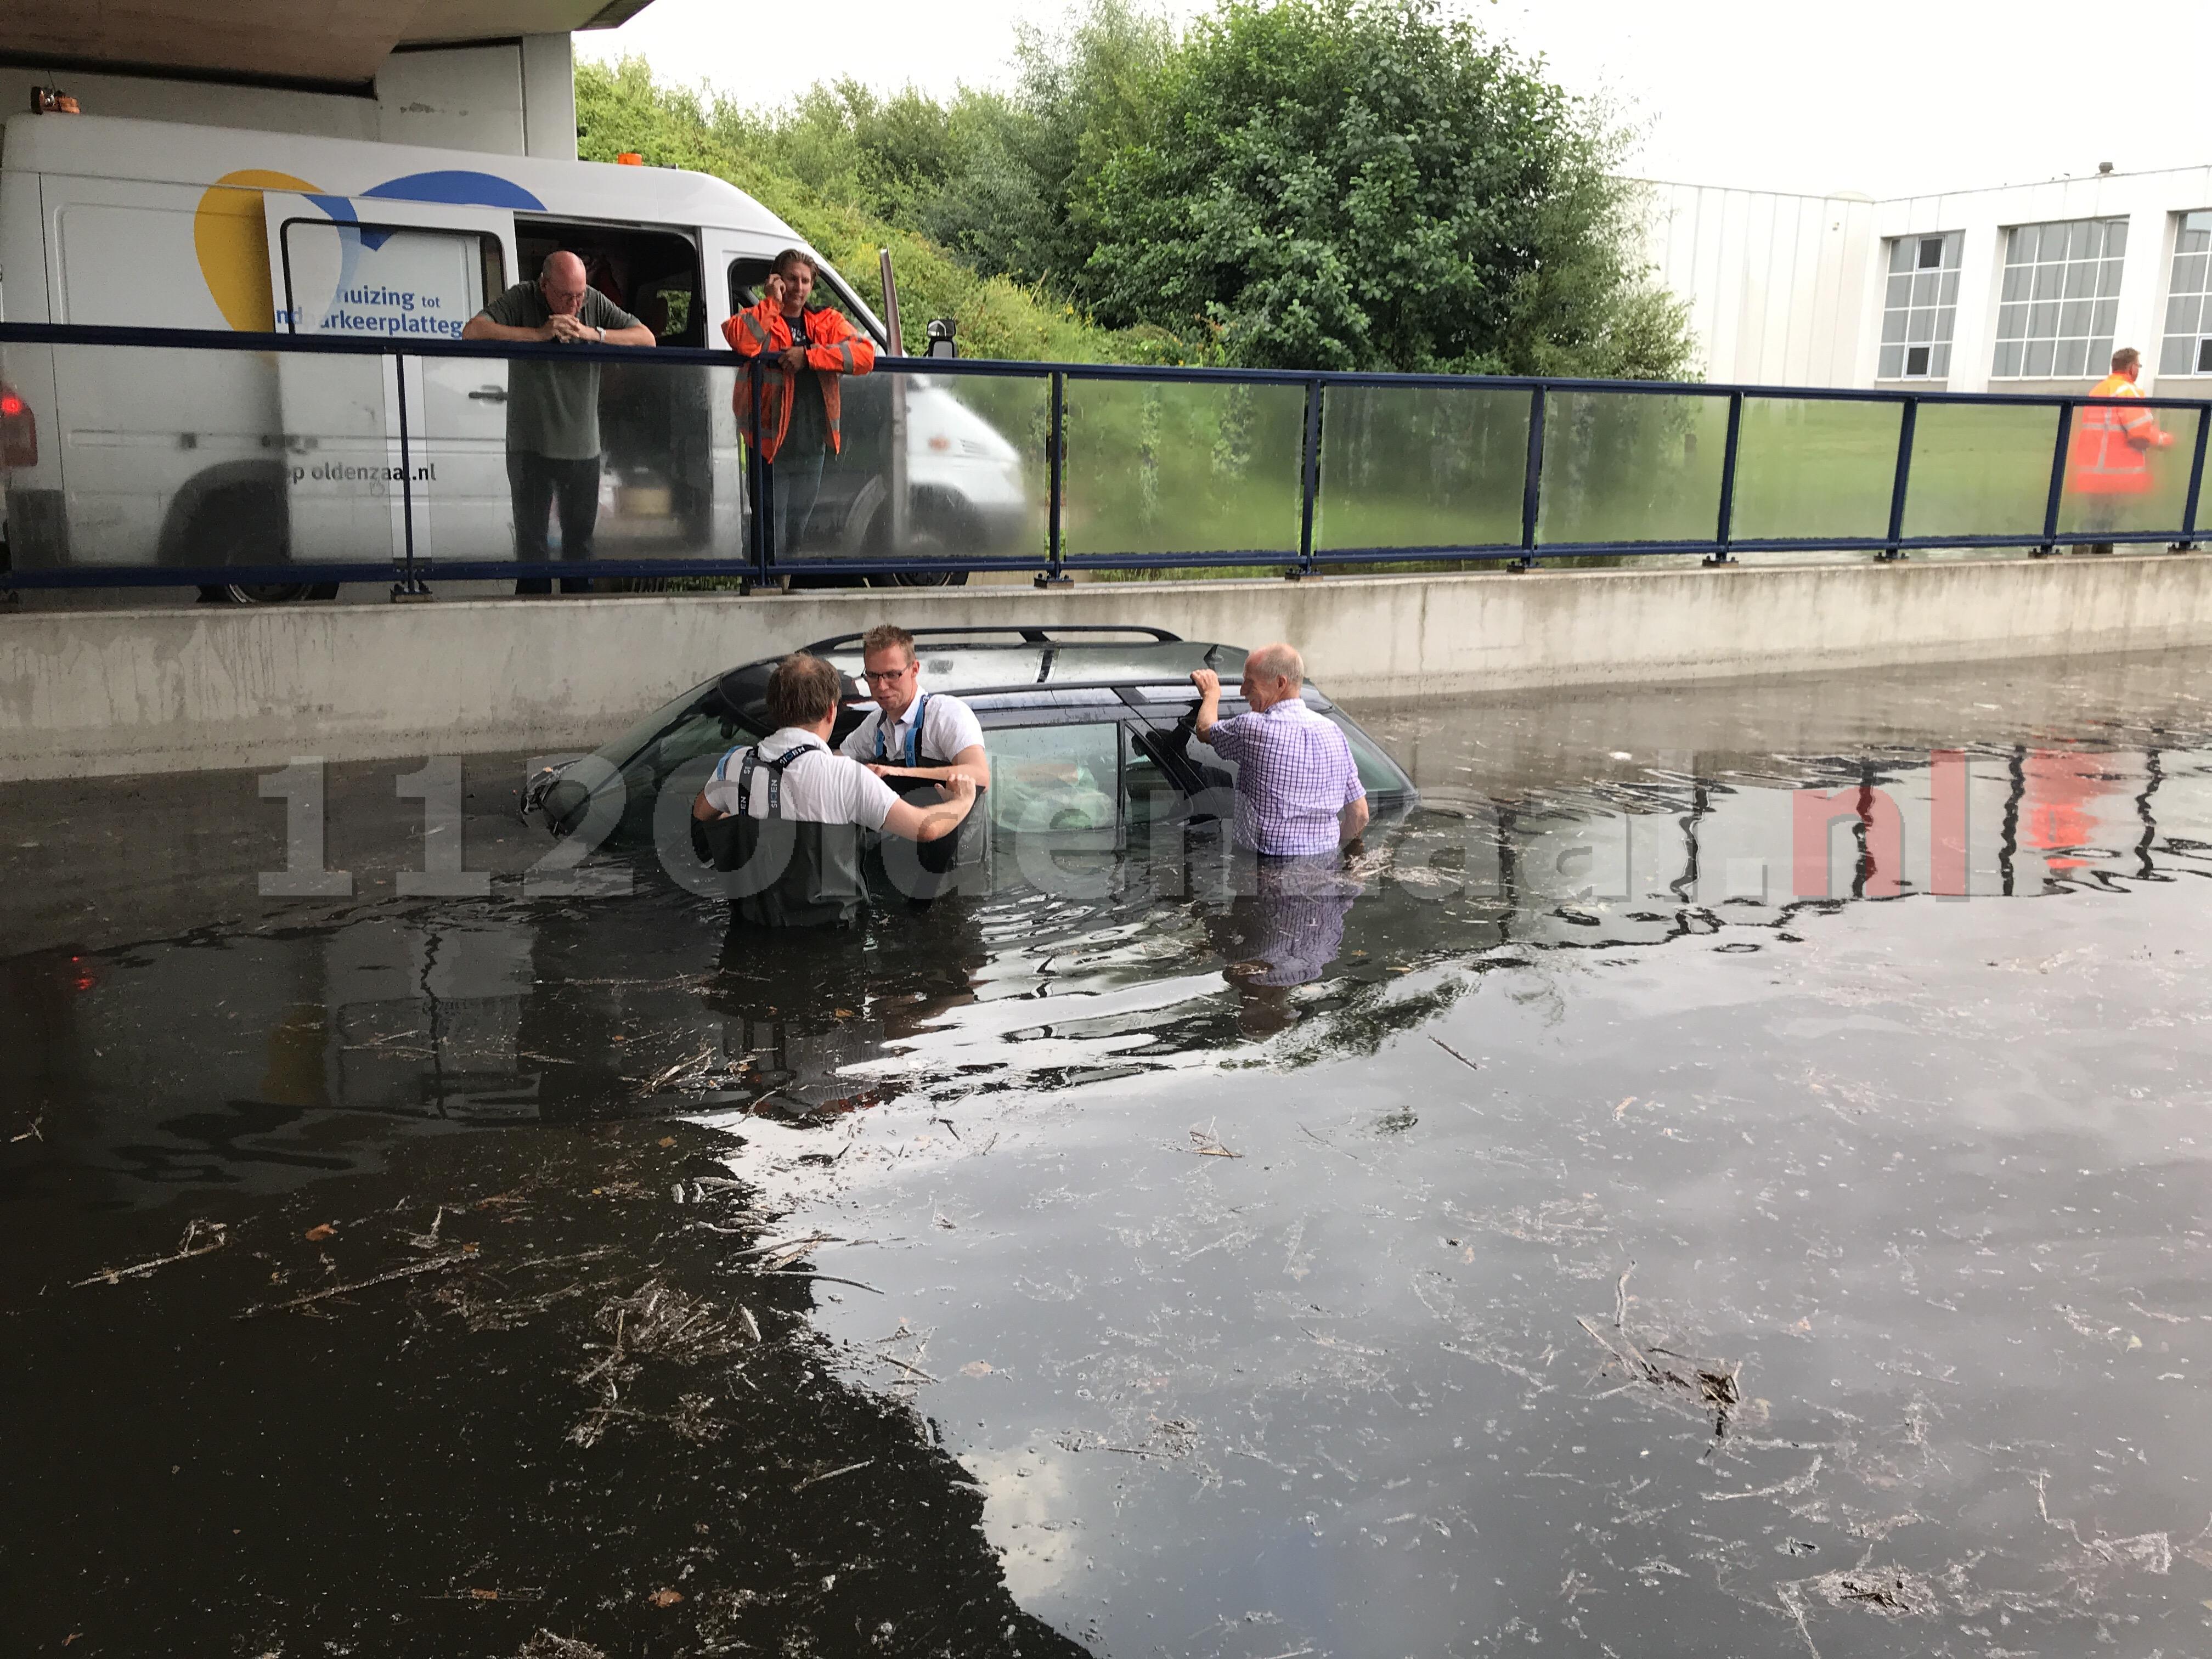 Foto 2: Auto kopje onder in tunnelbak van viaduct na hevige regenval Oldenzaal